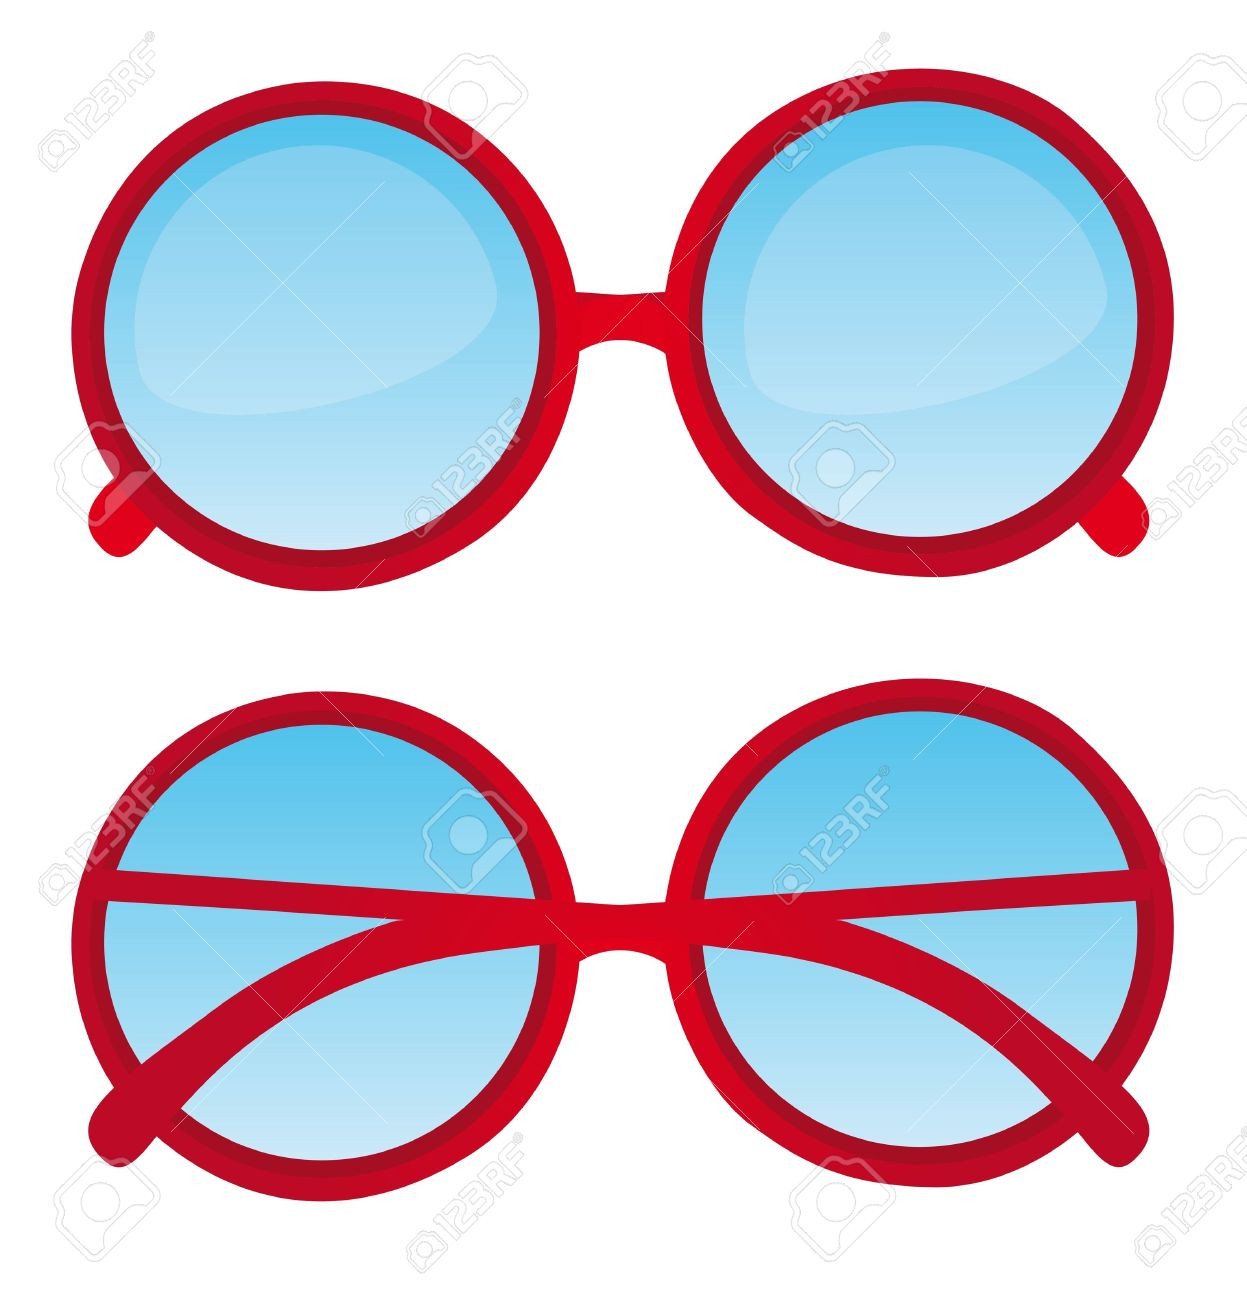 Red nerd glasses clipart.